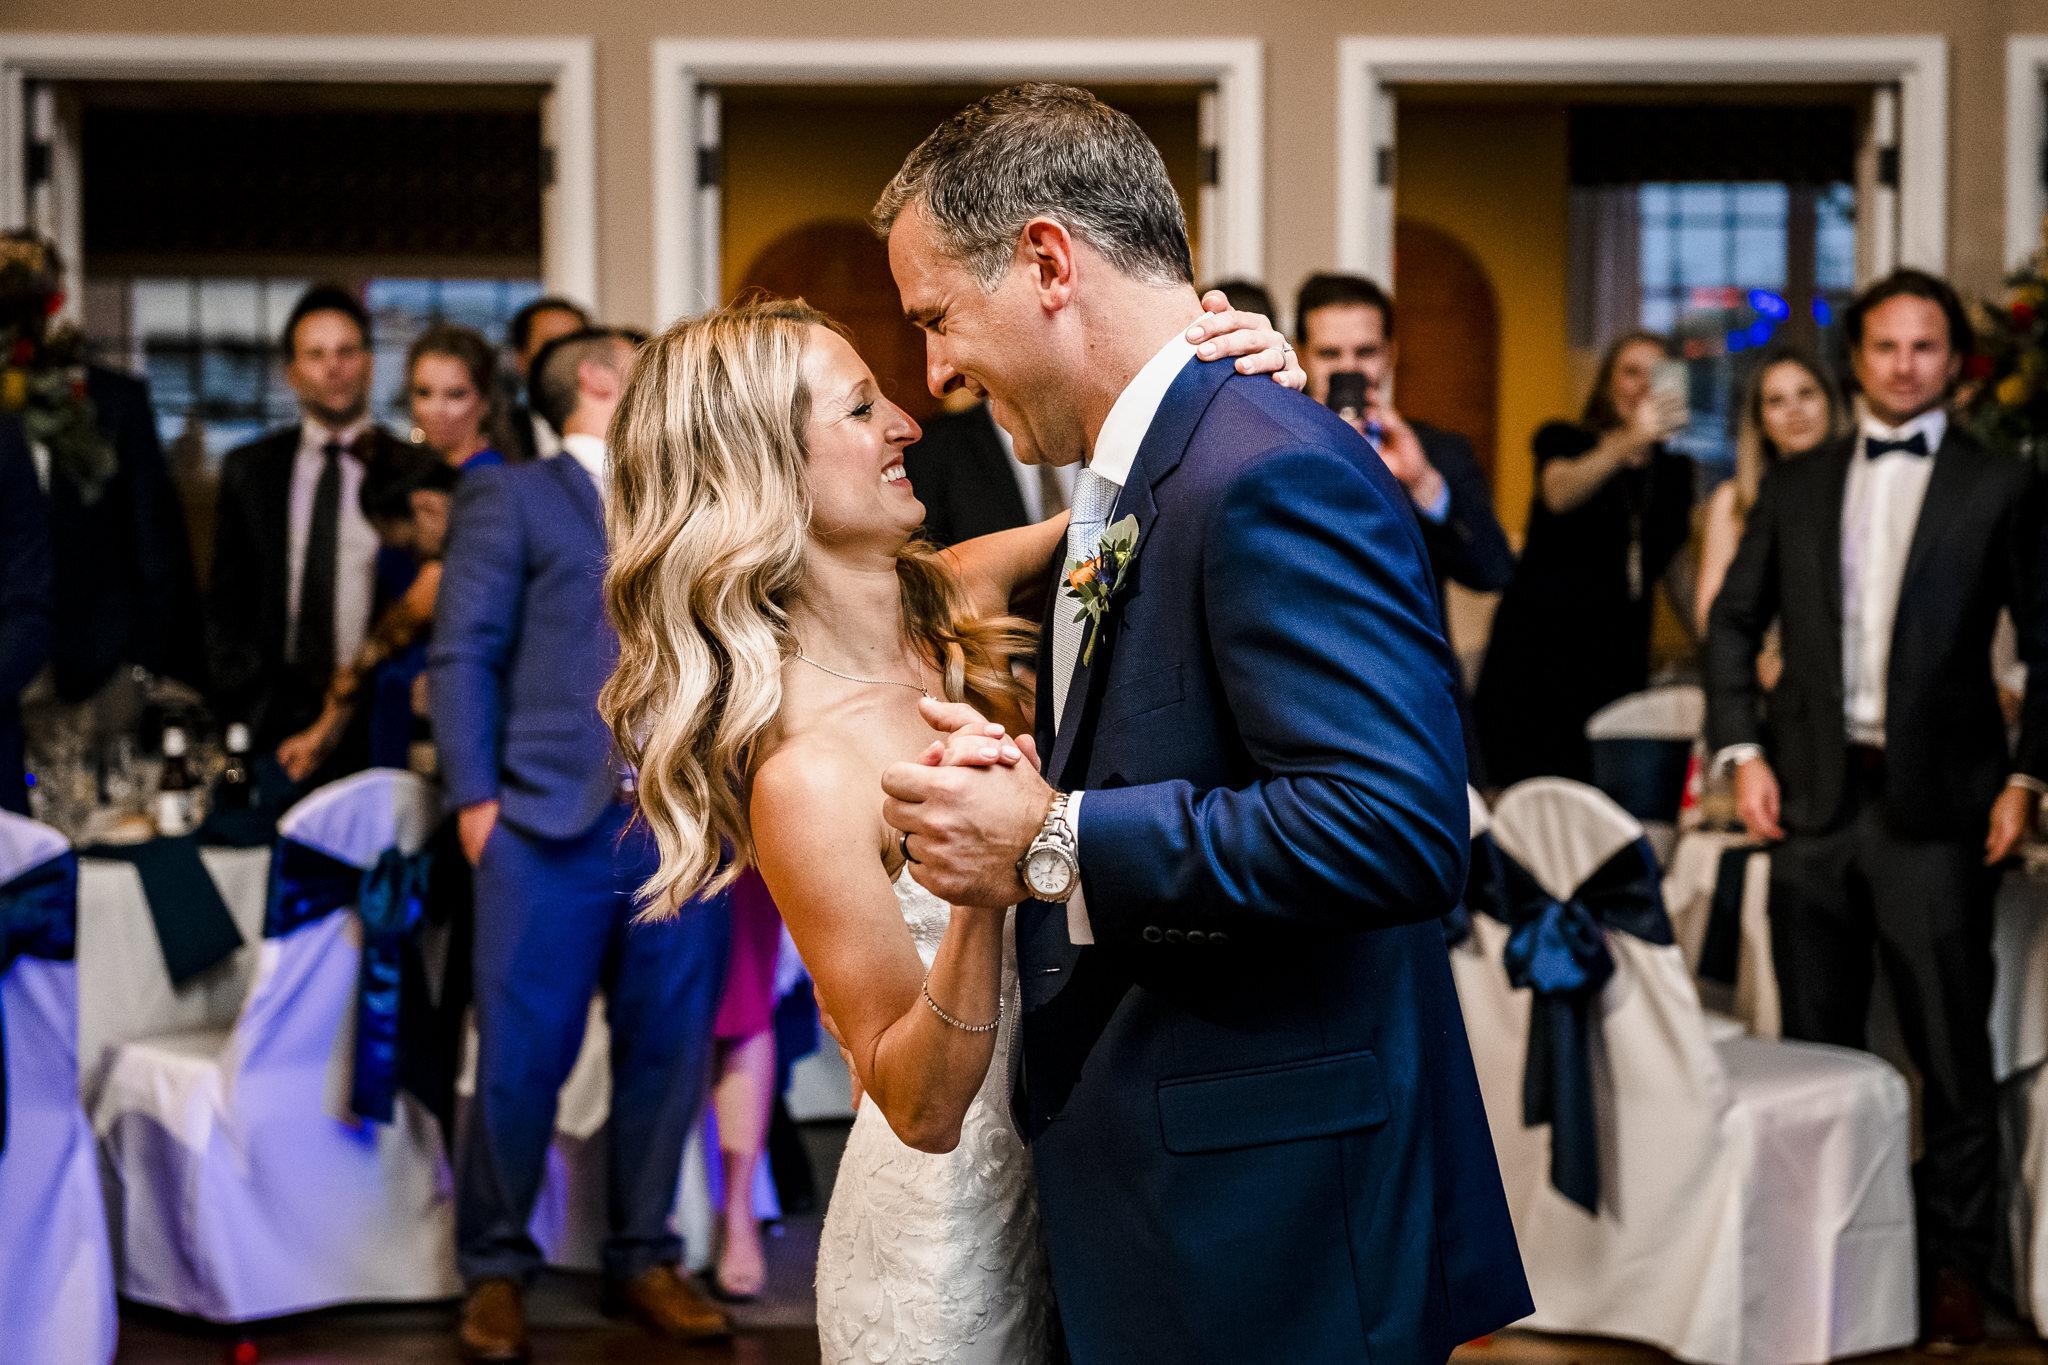 Snell-Ocean-City-Yacht-Club-New-Jersey-Wedding-Photographer-25.JPG